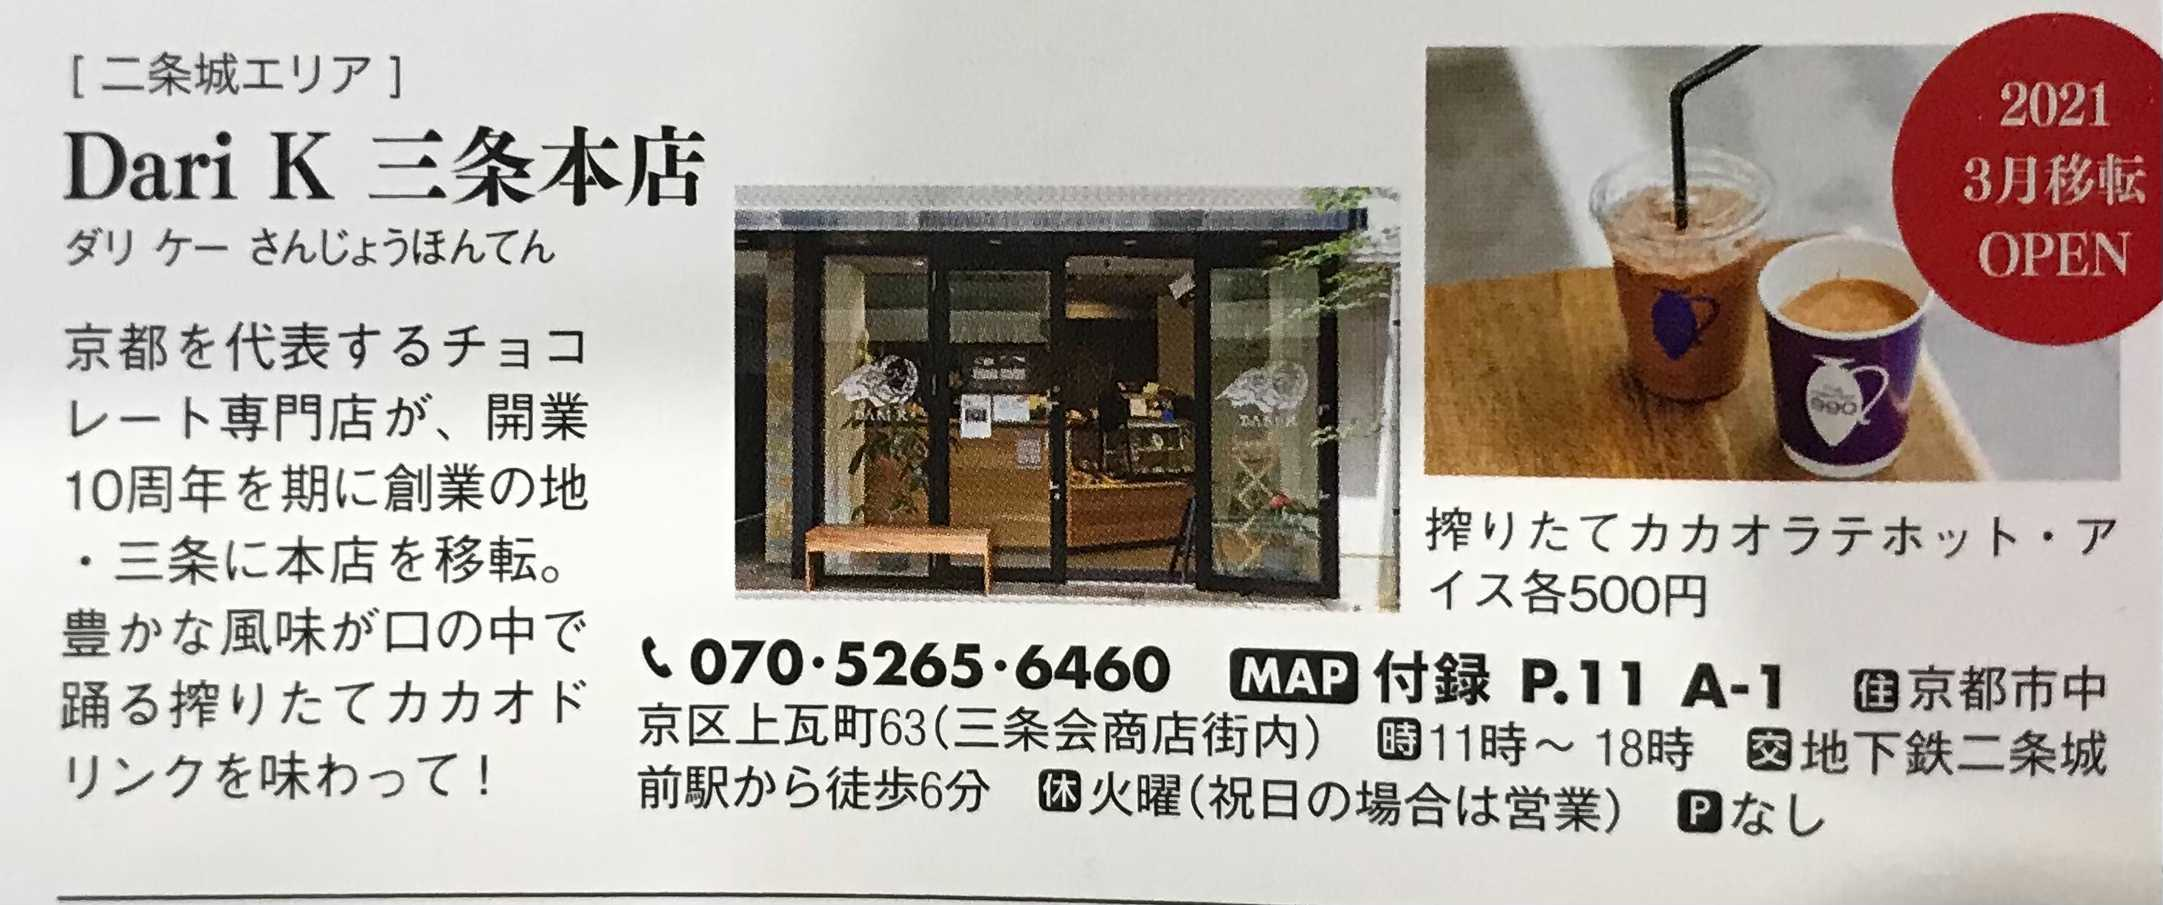 「秋の京都2021」該当箇所